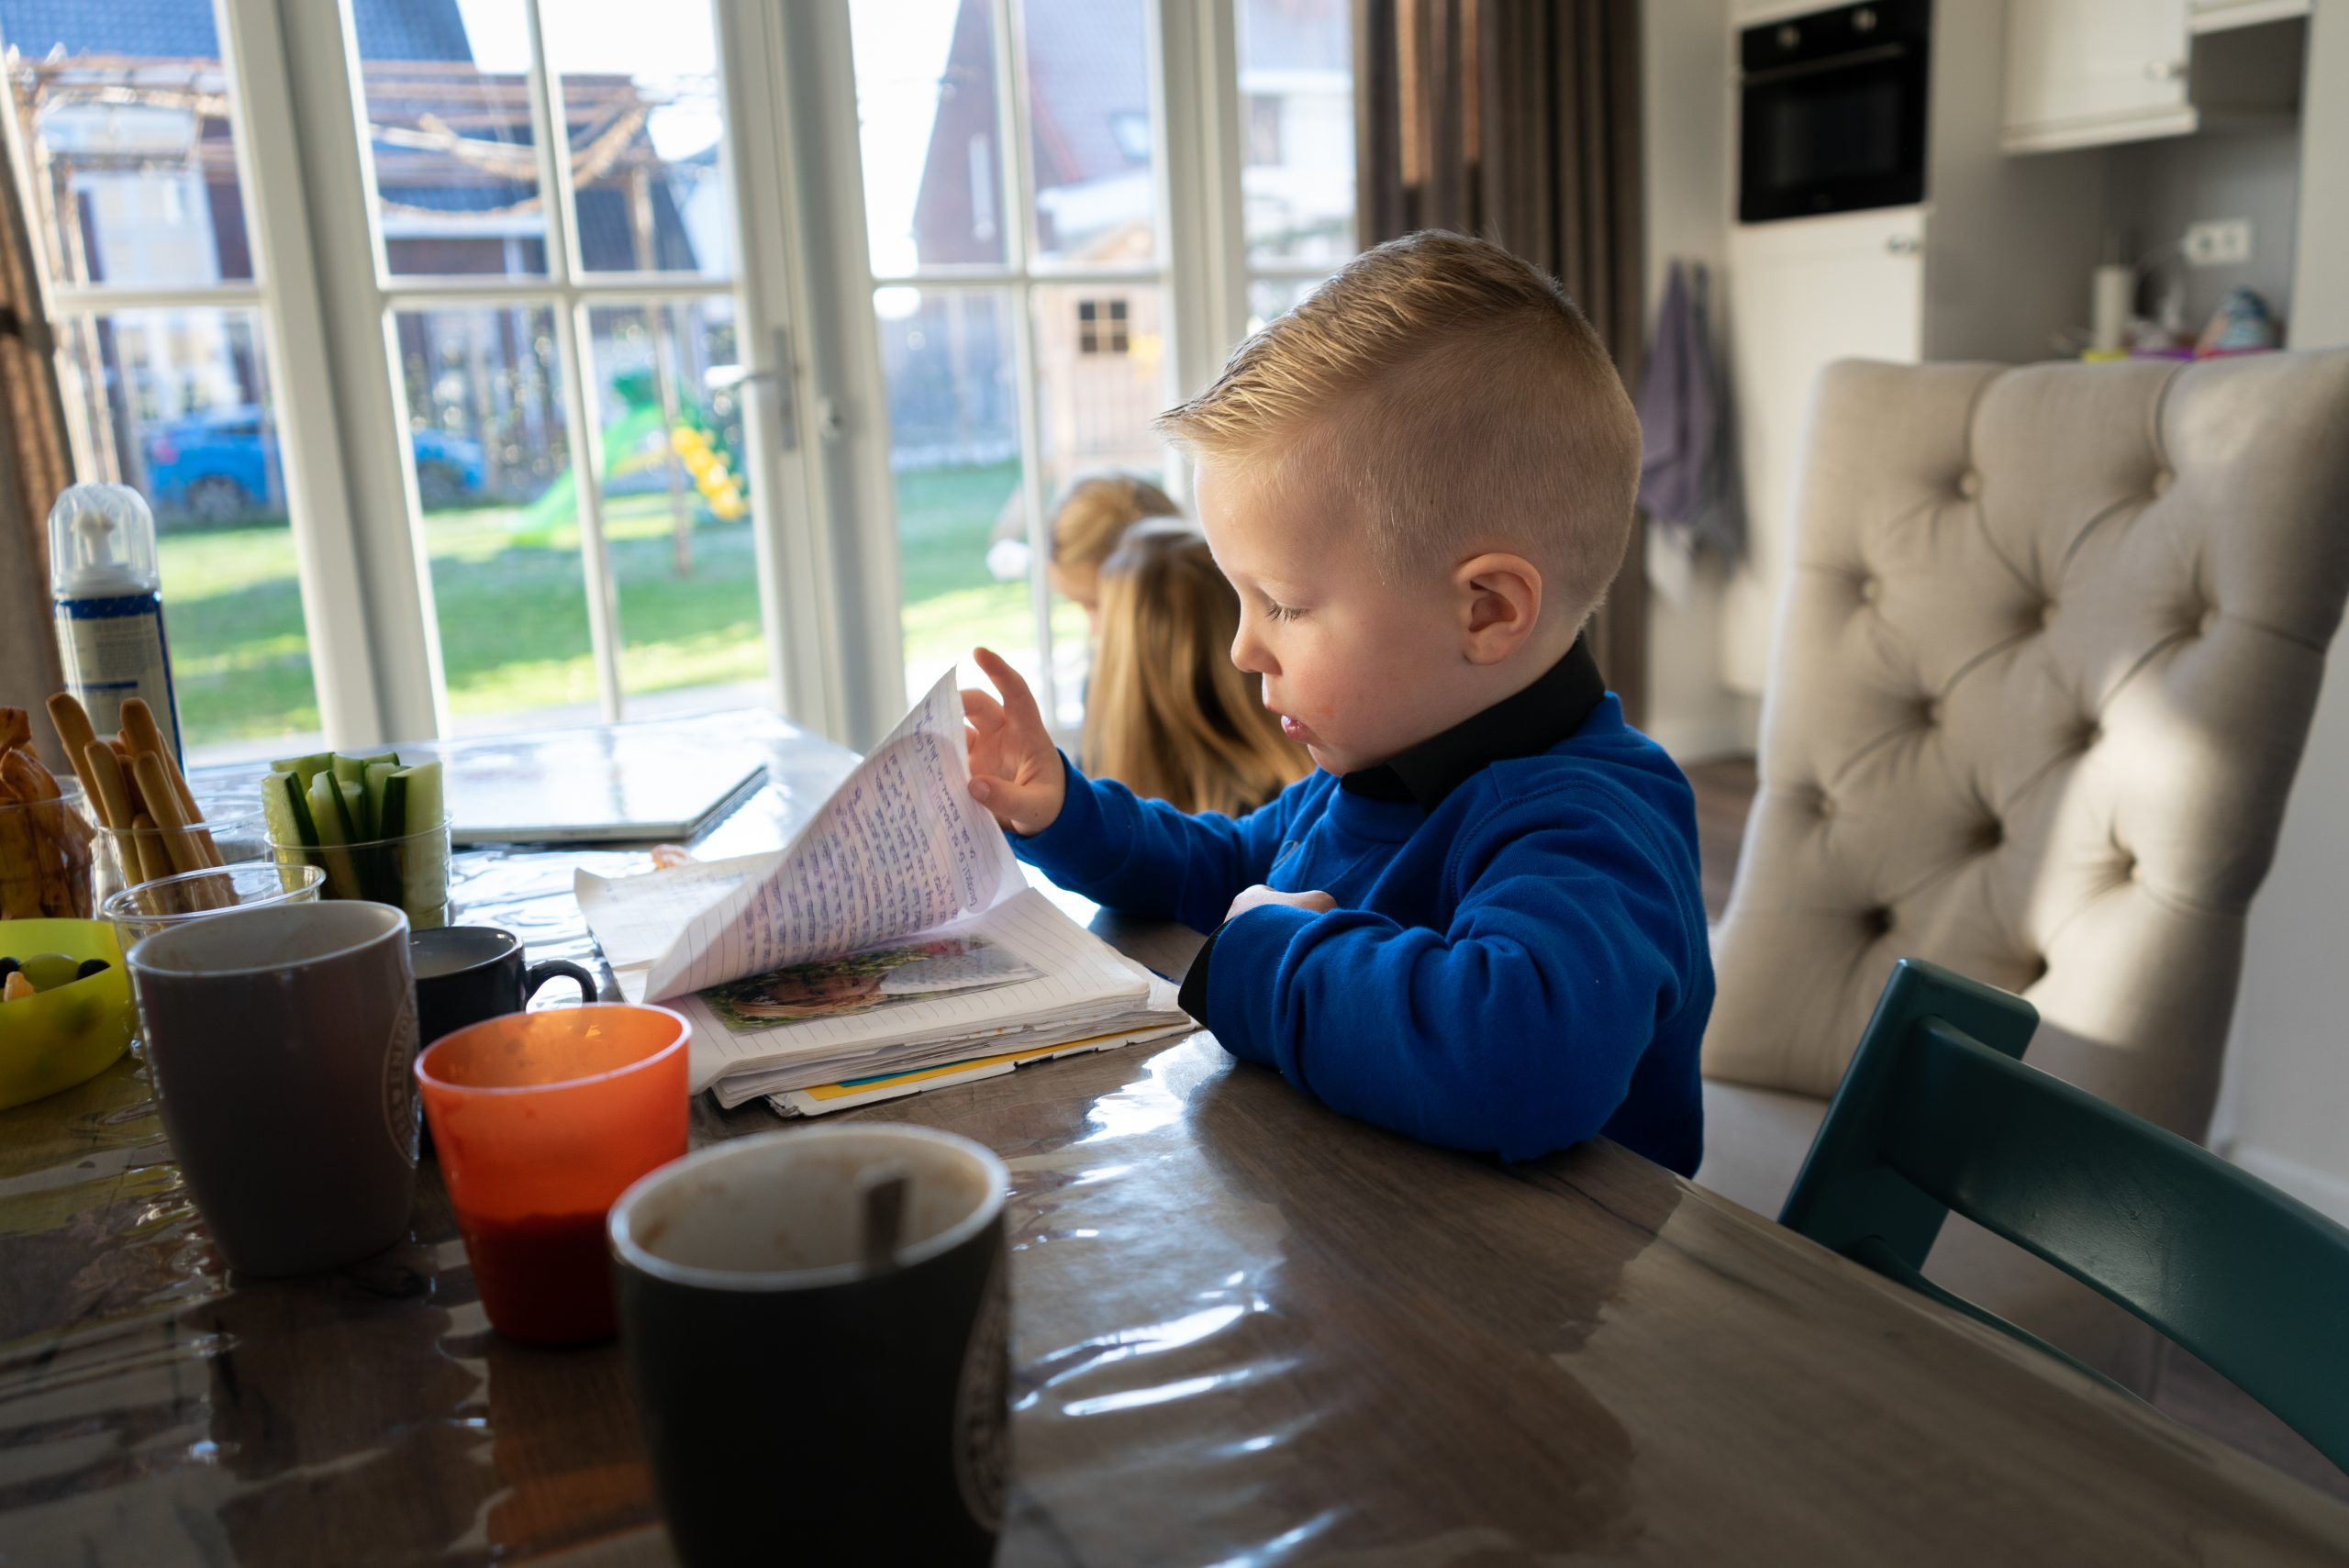 WenSmedia - Familiefotoshoot Fam. vd Dorpel